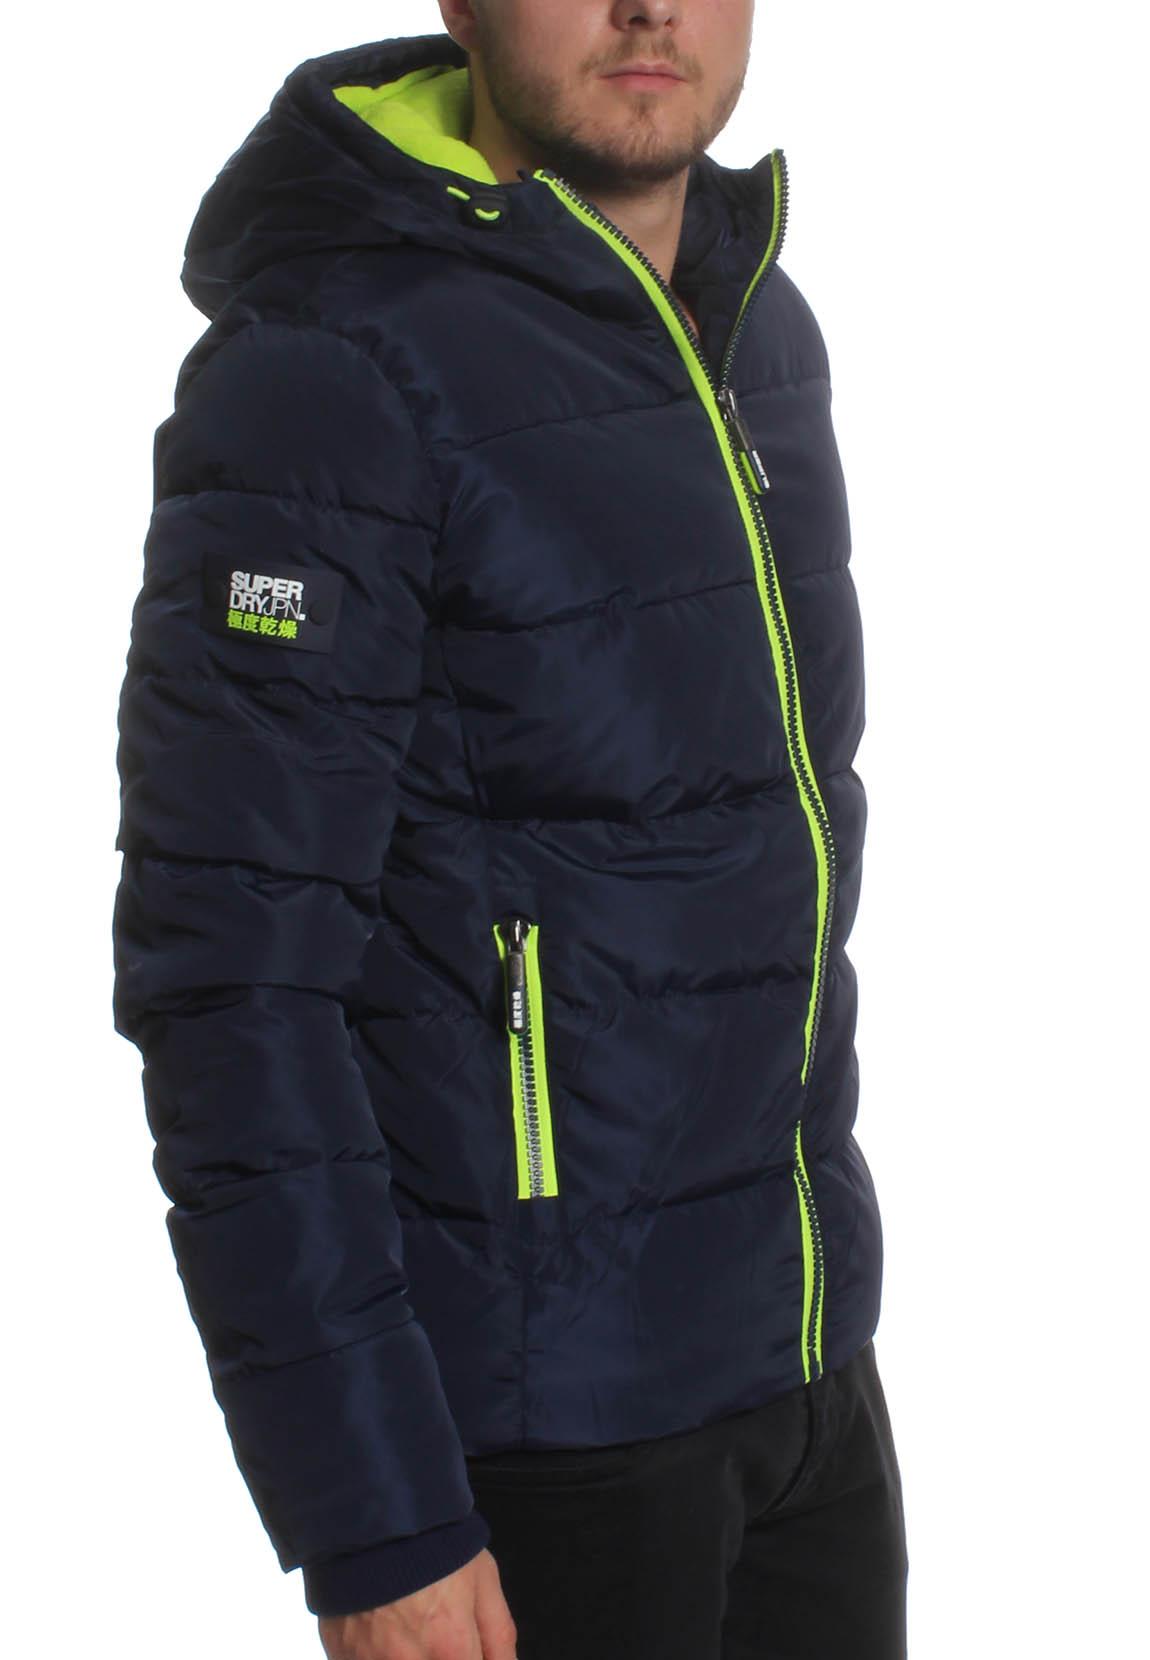 premium selection 6af98 6800f Details zu Superdry Jacke Herren SPORTS PUFFER Navy Lime Punch